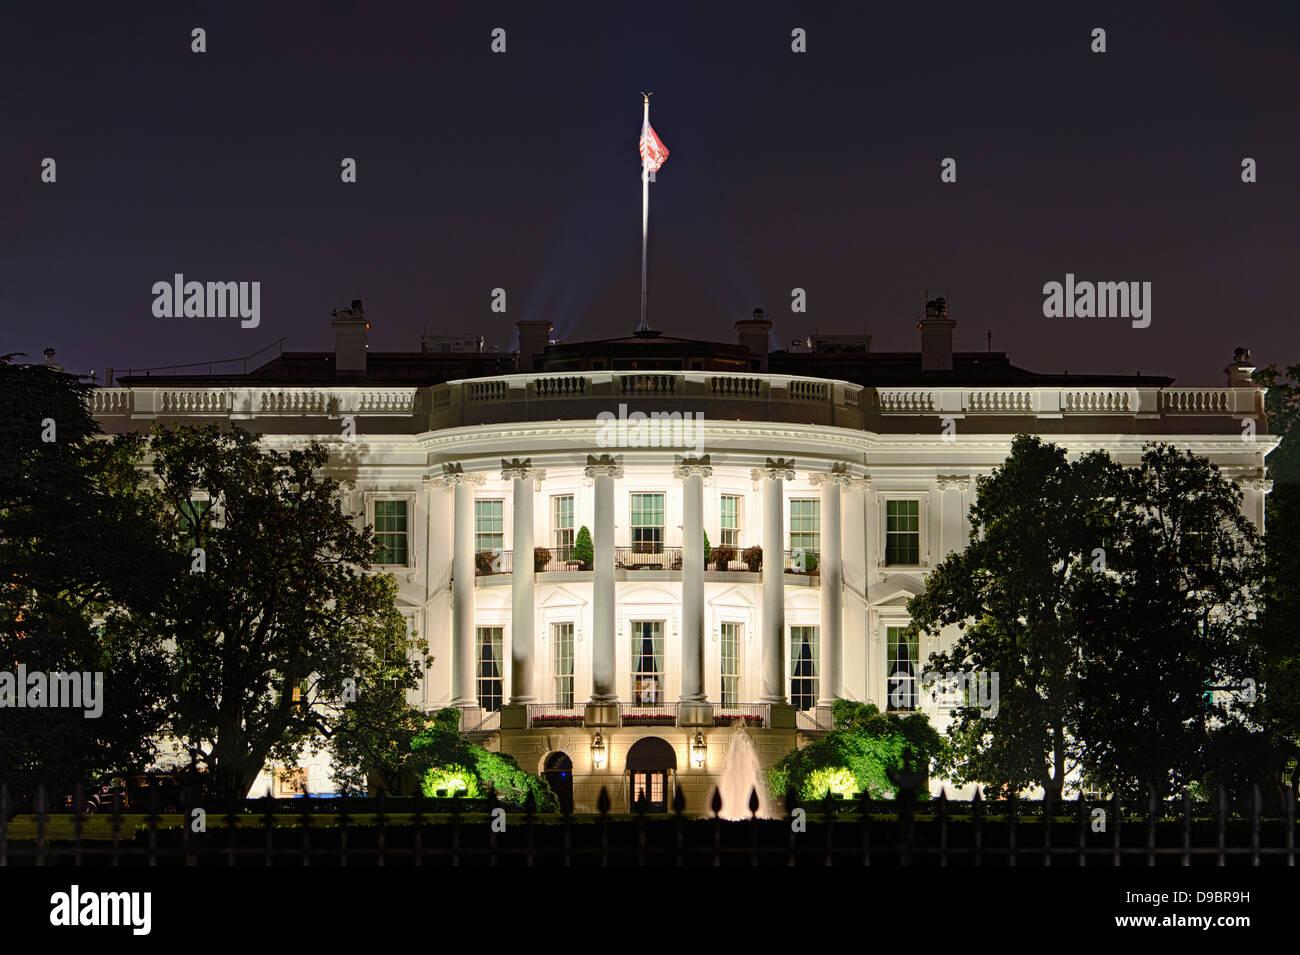 The White House, home of the United States President, Washington D.C., USA - Stock Image